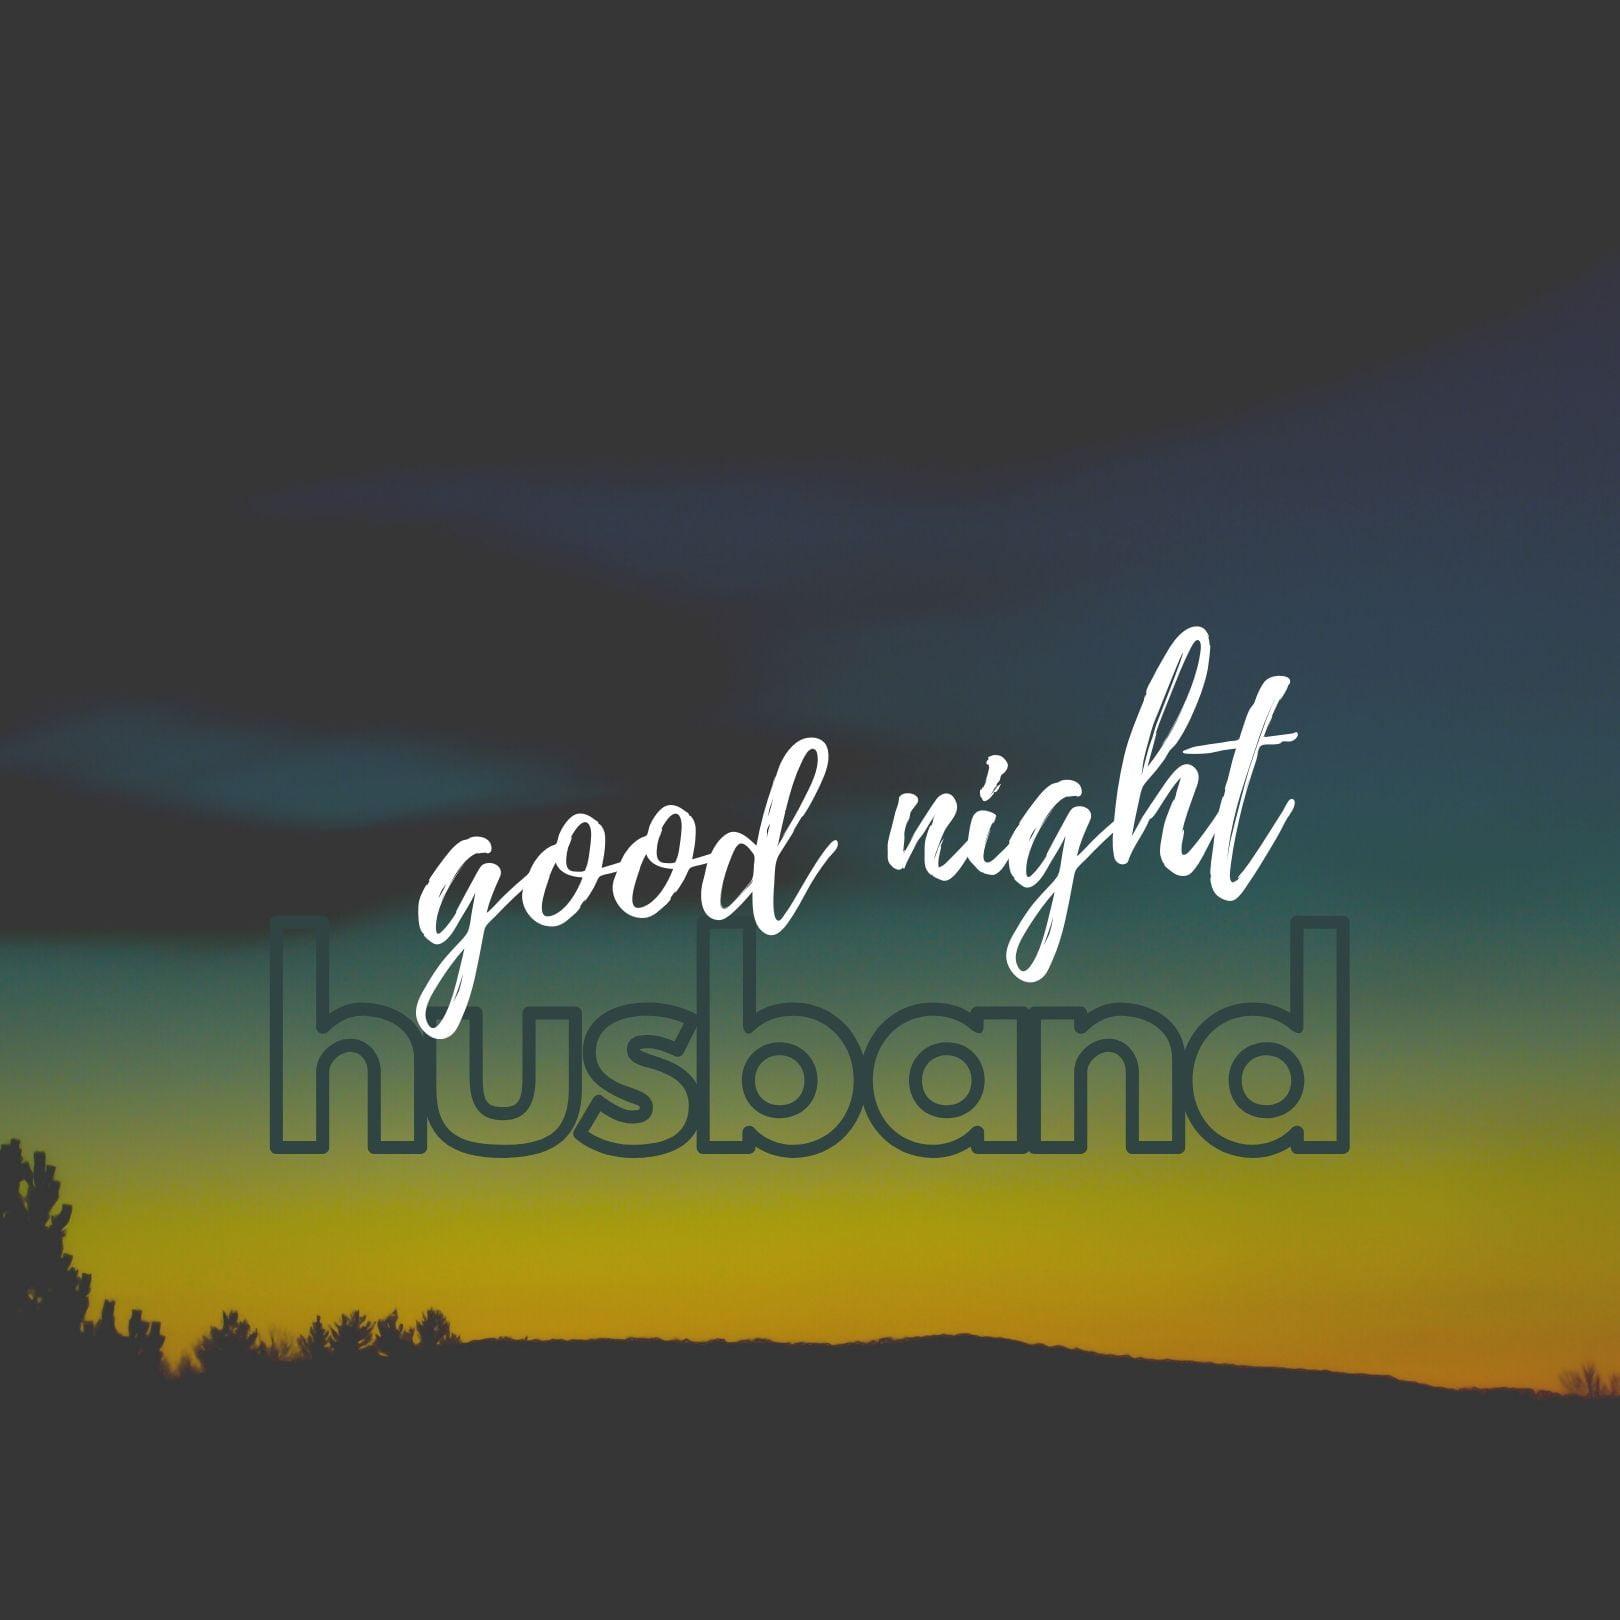 Good Night Husband Pic full HD free download.